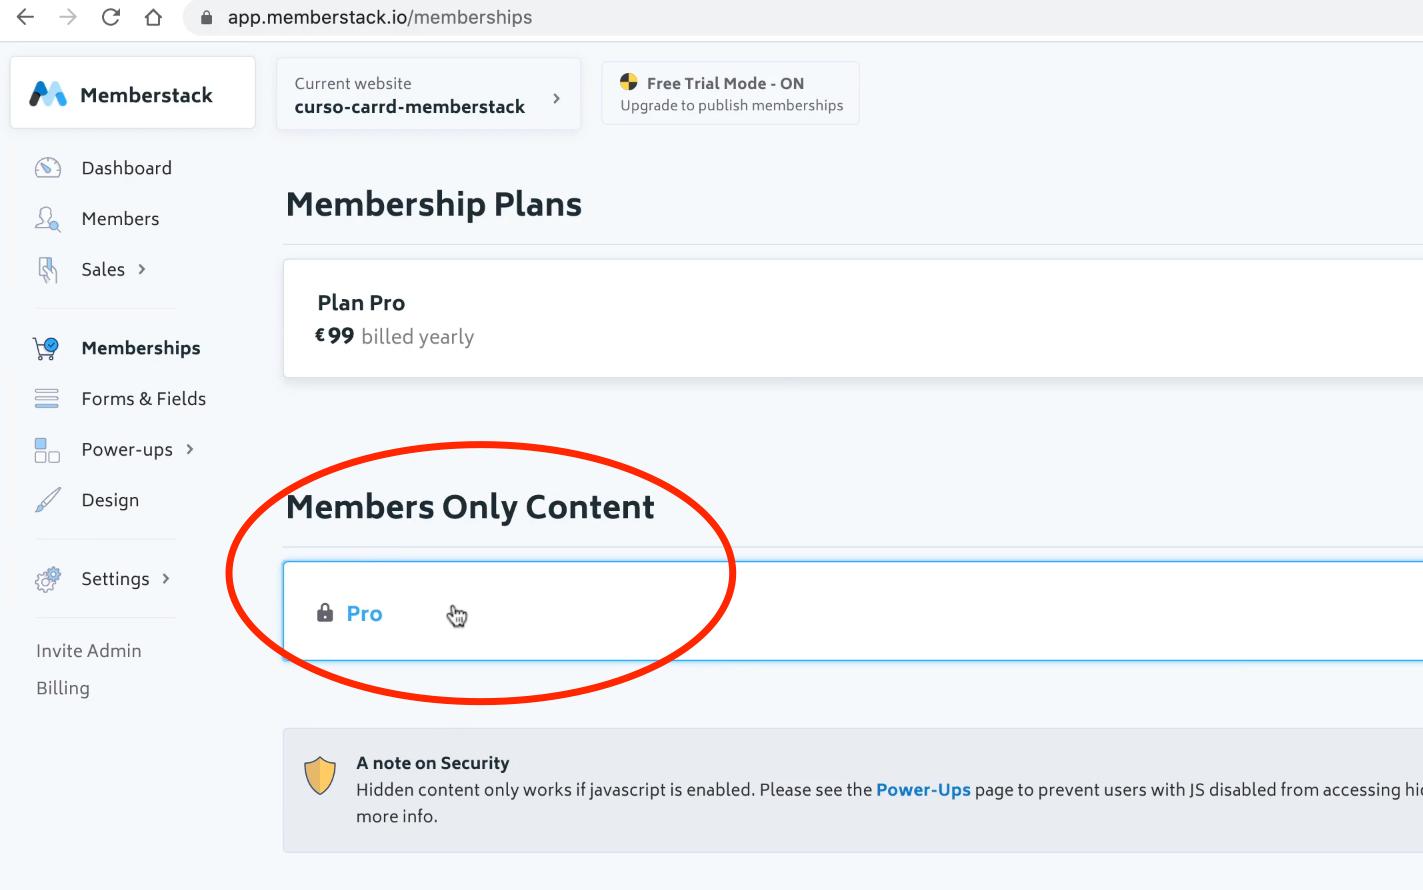 Memberstack Members Only Content